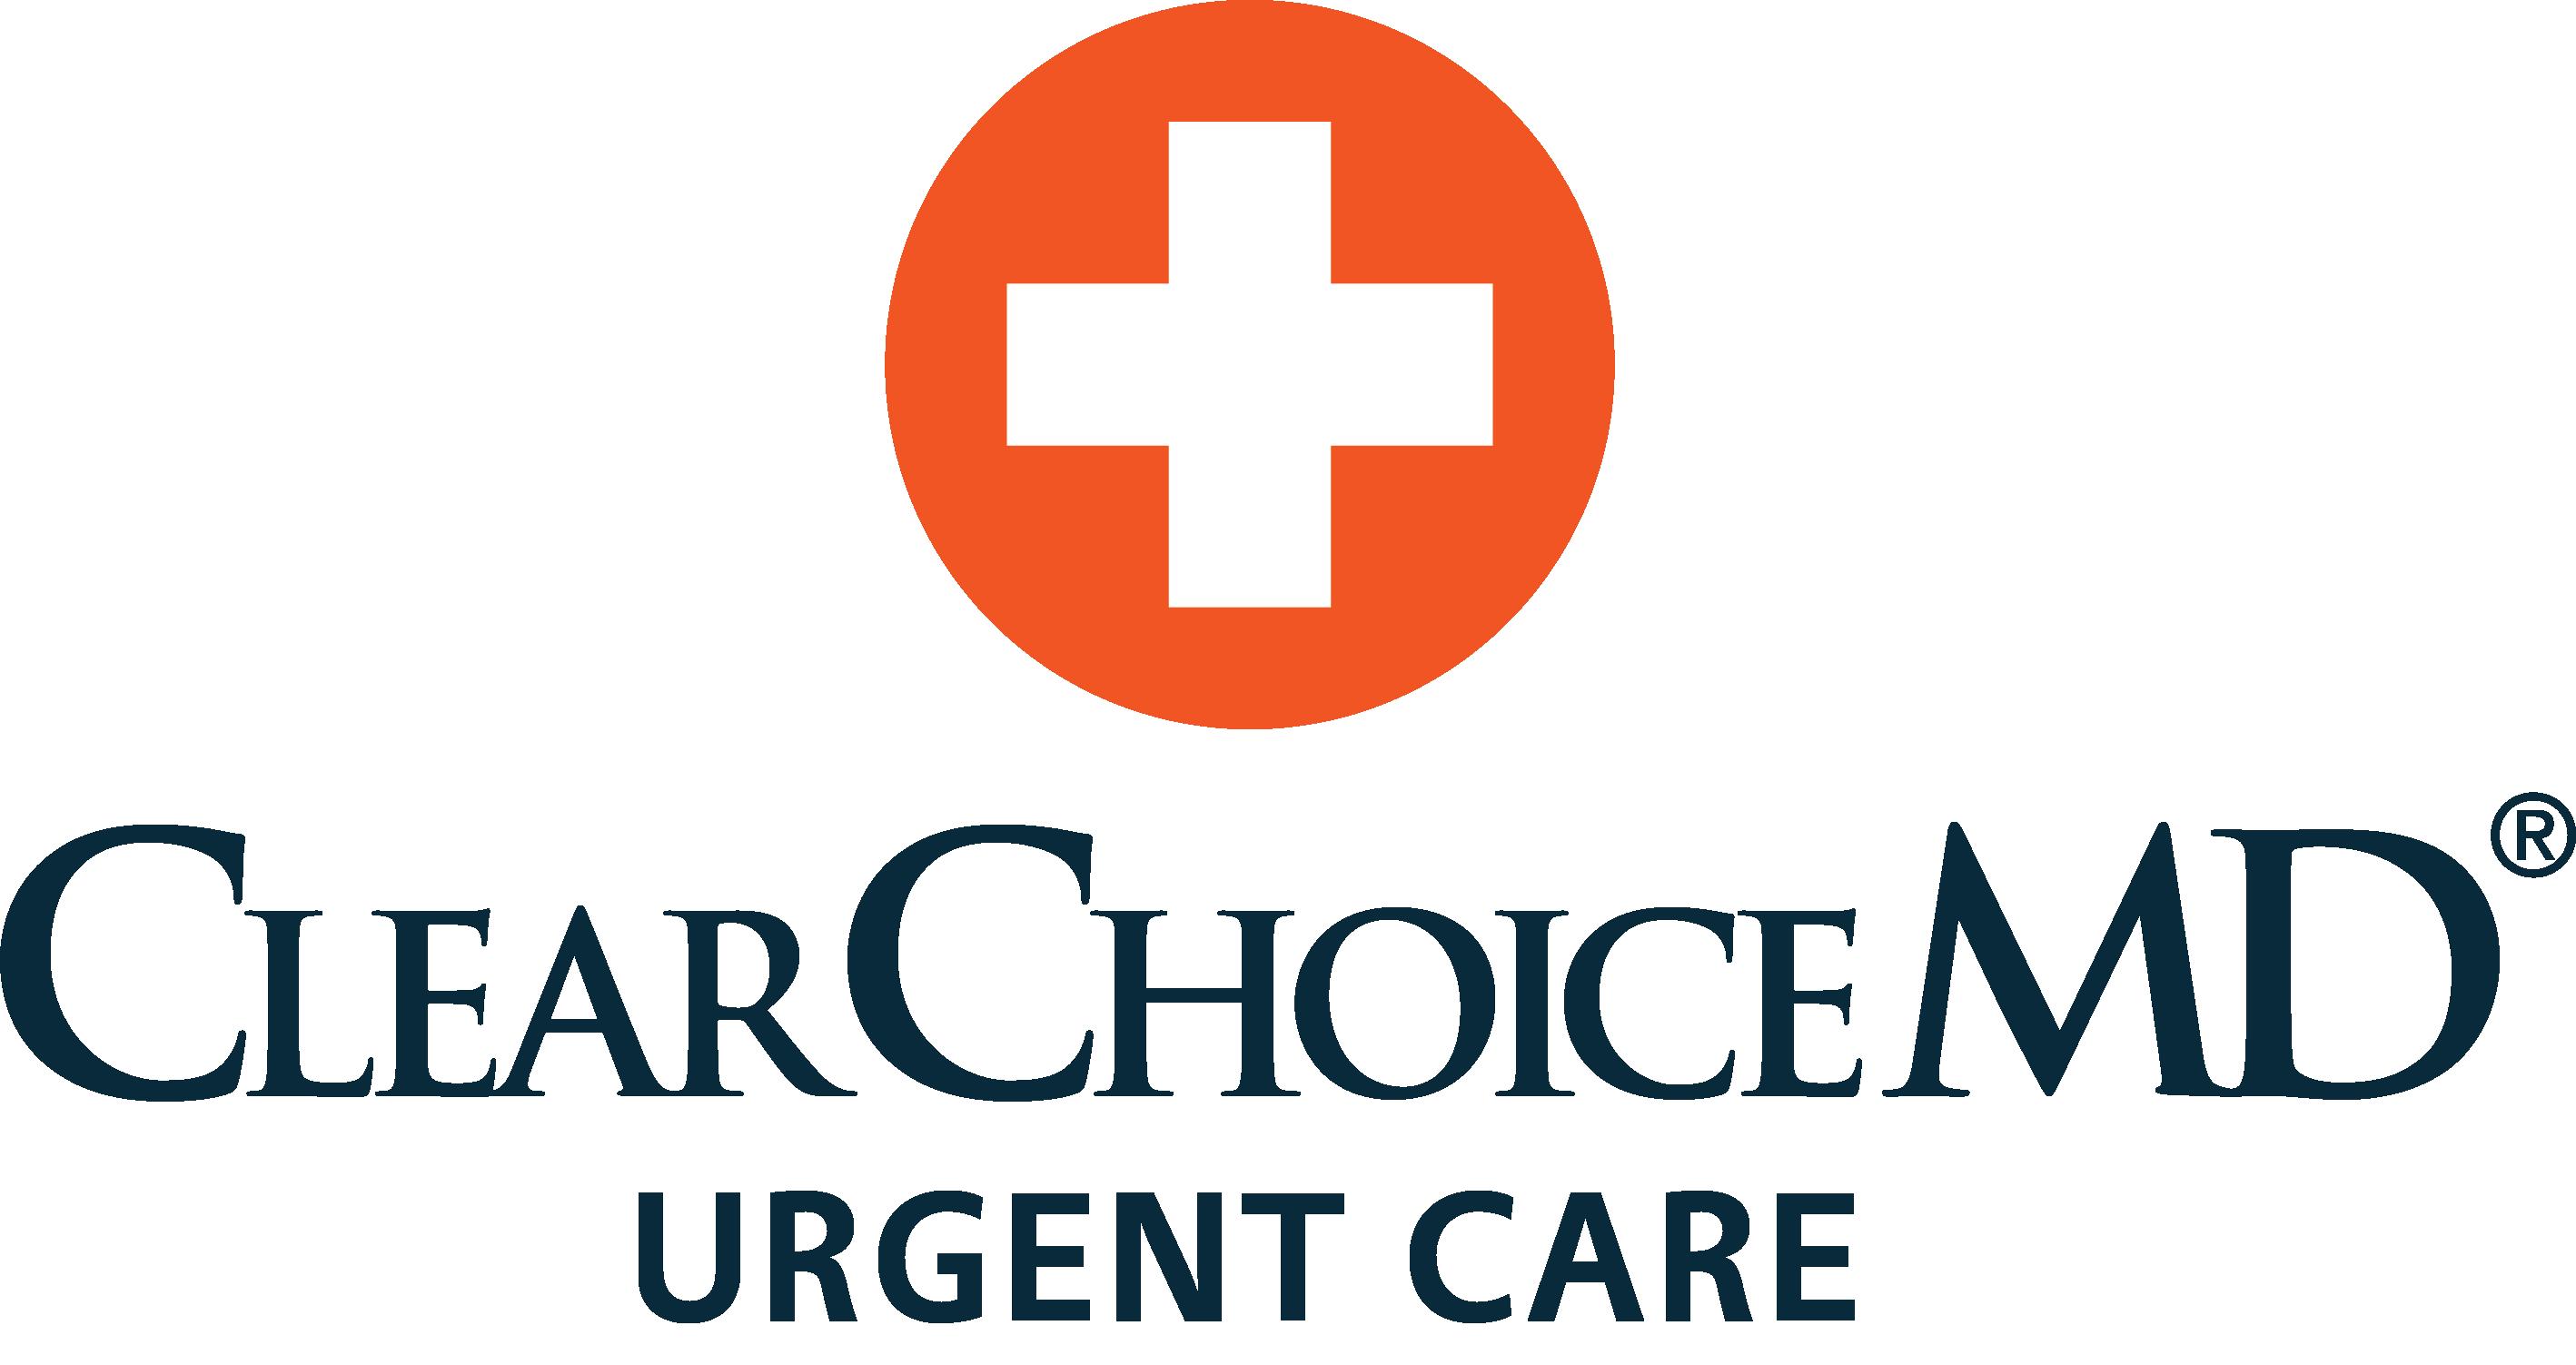 ClearChoiceMD Urgent Care - Rutland, VT Logo